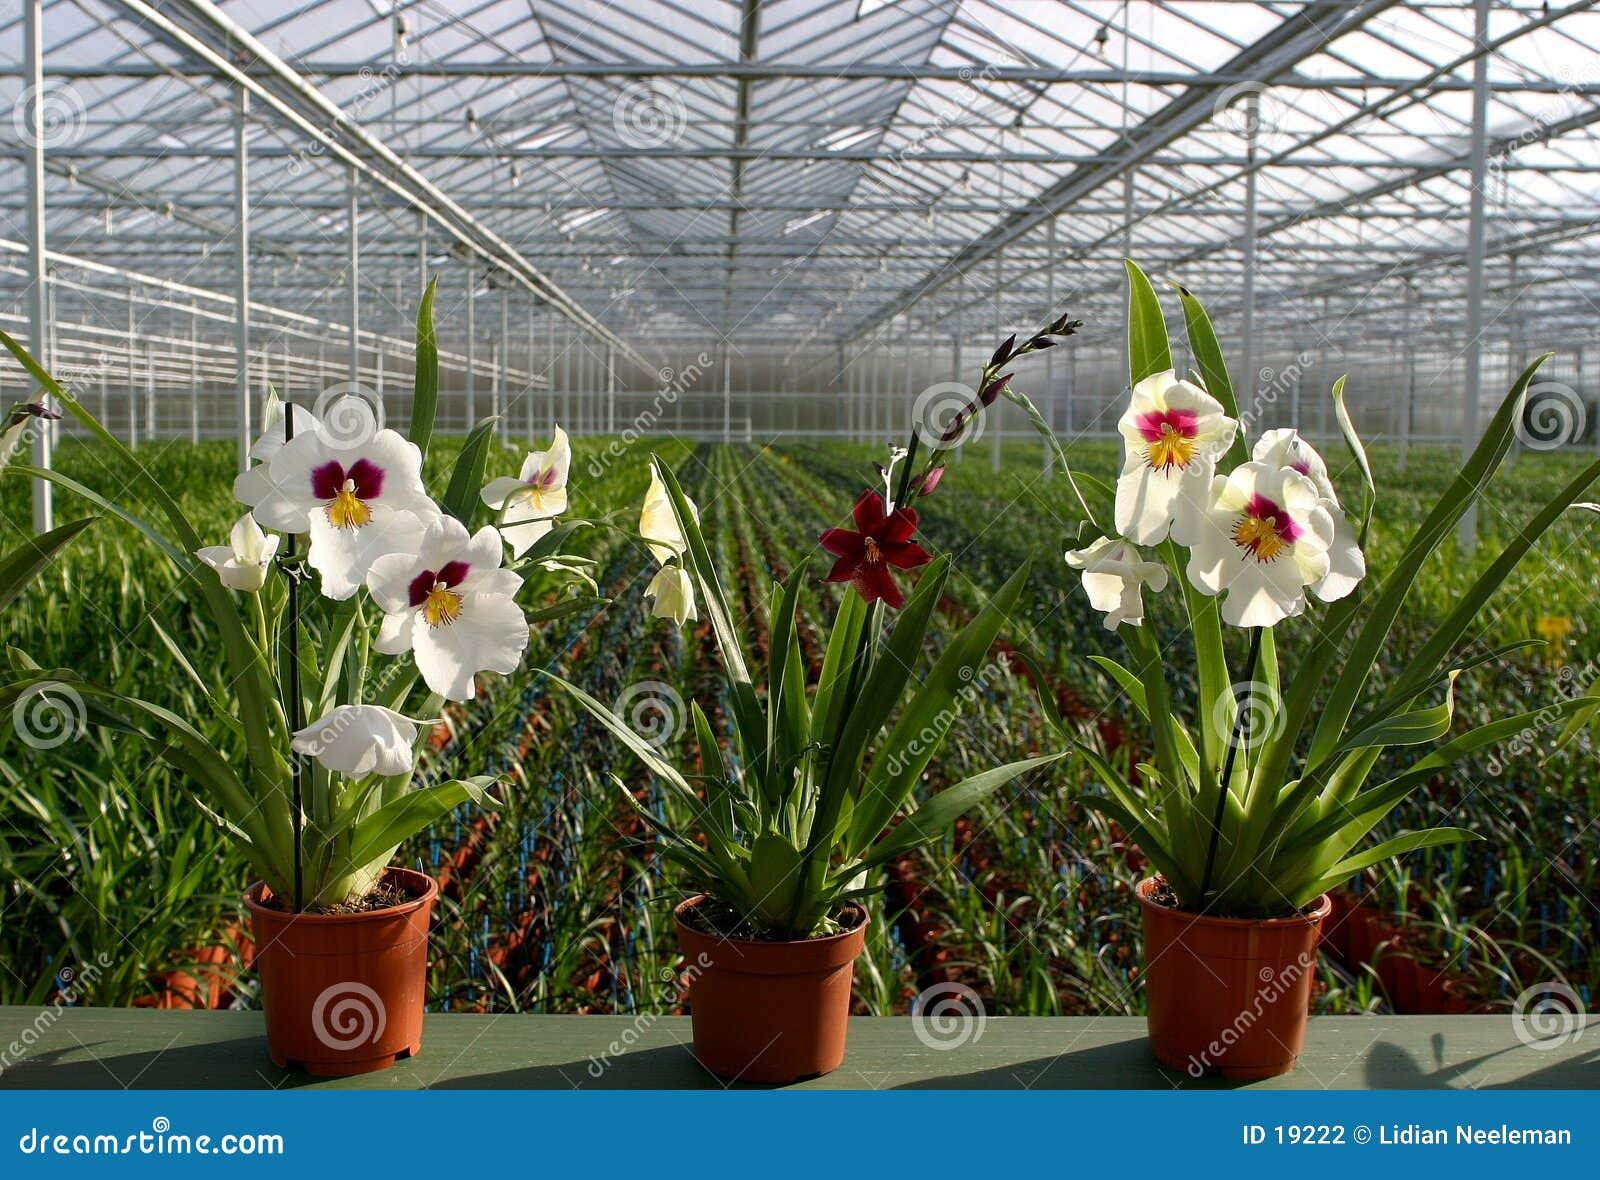 Anlagenc$baumschule-orchideen